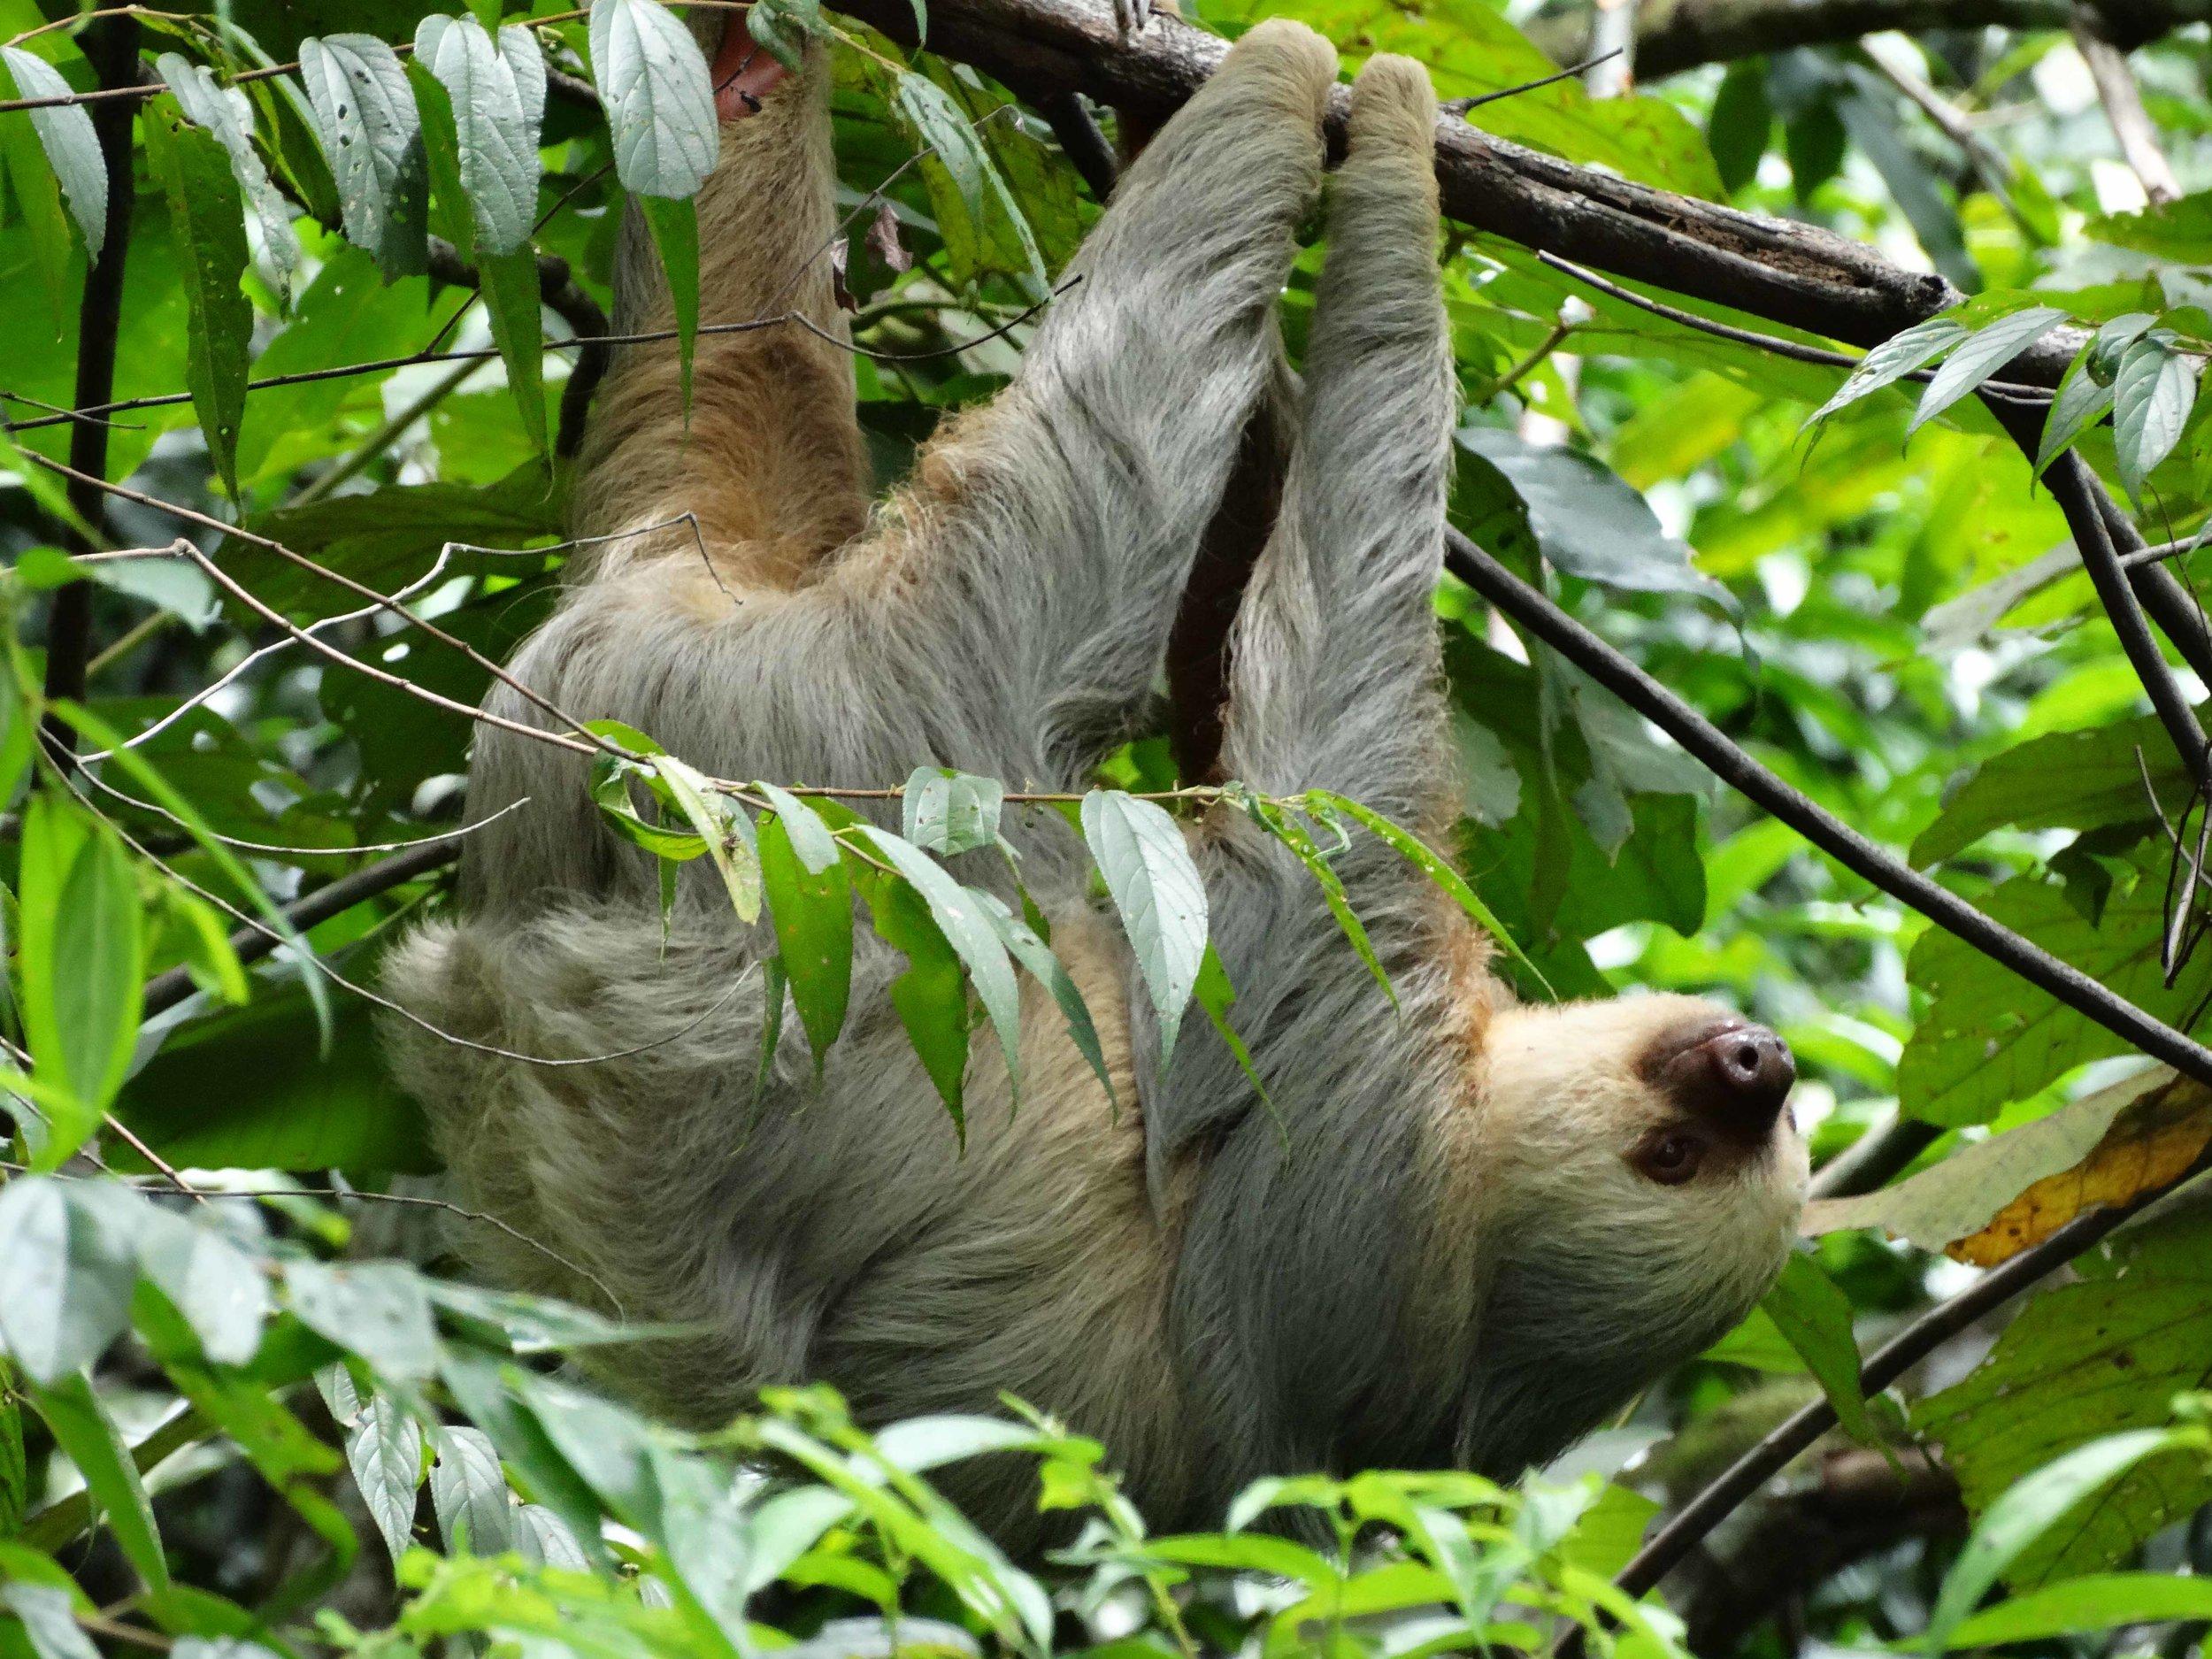 Manuel Antonio National Park - Most visited park in Costa Rica